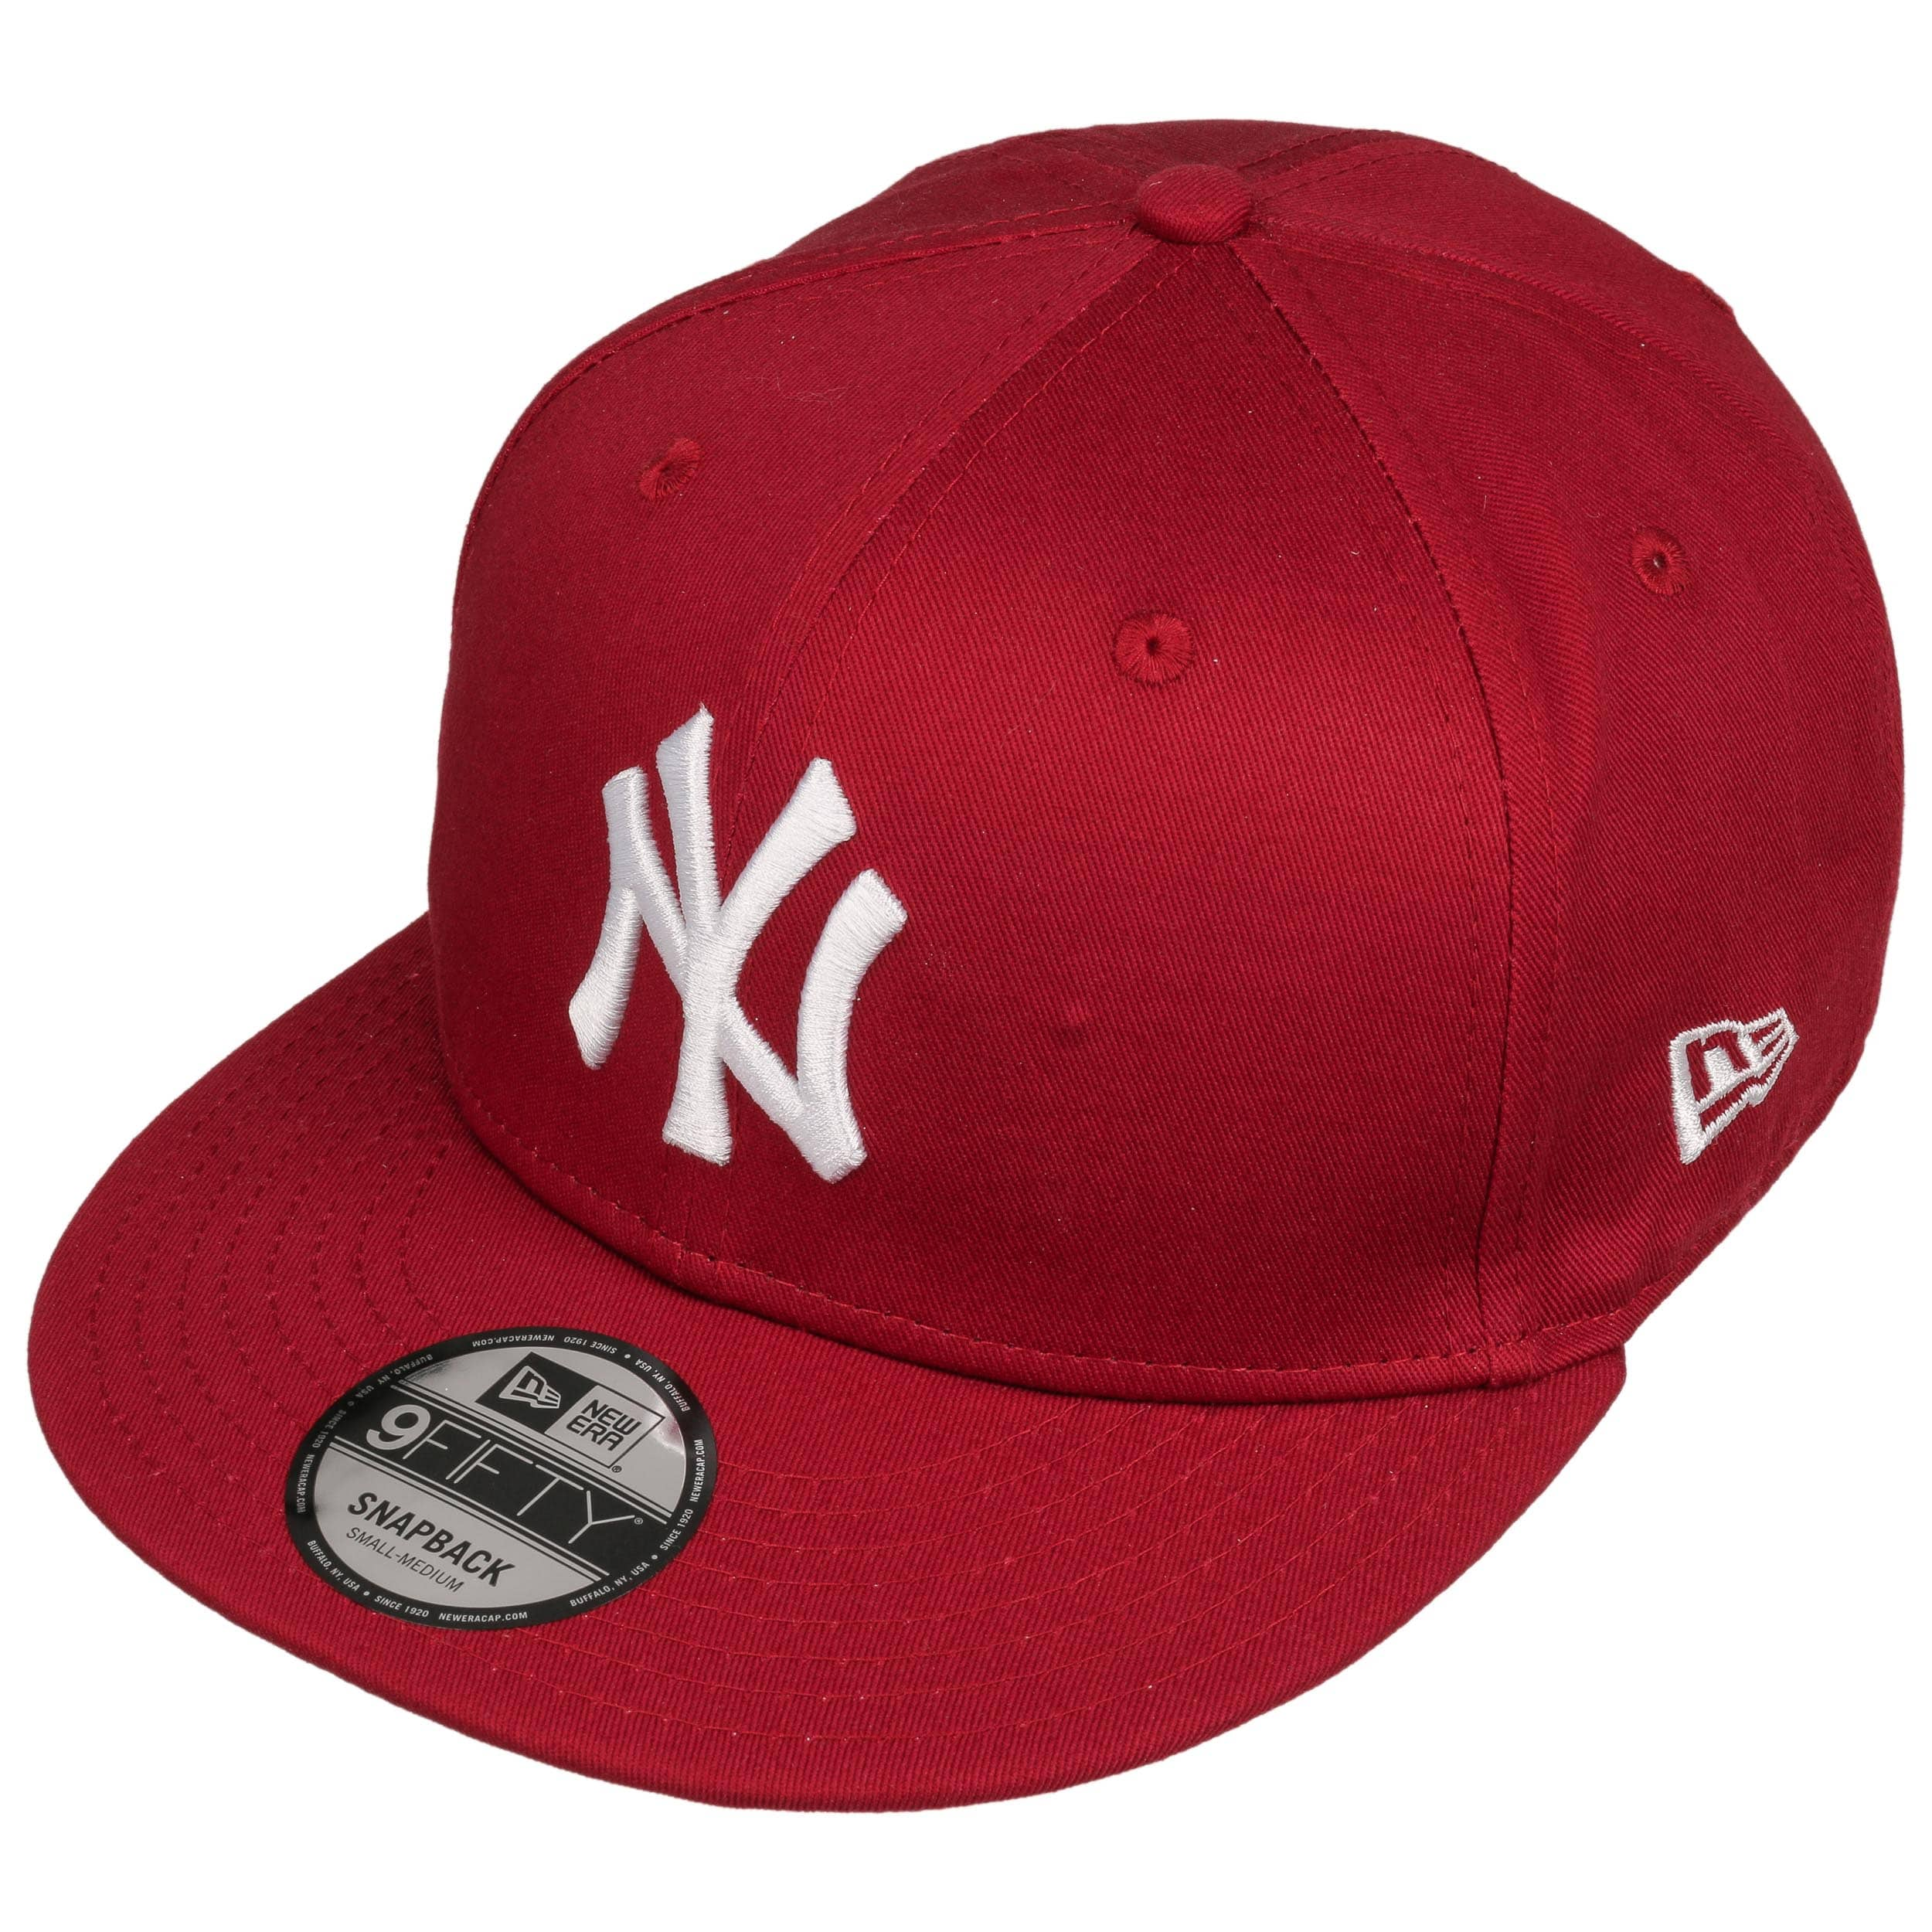 453df4f5dda ... 9Fifty Ess NY Yankees Cap by New Era - black-white 1 ...